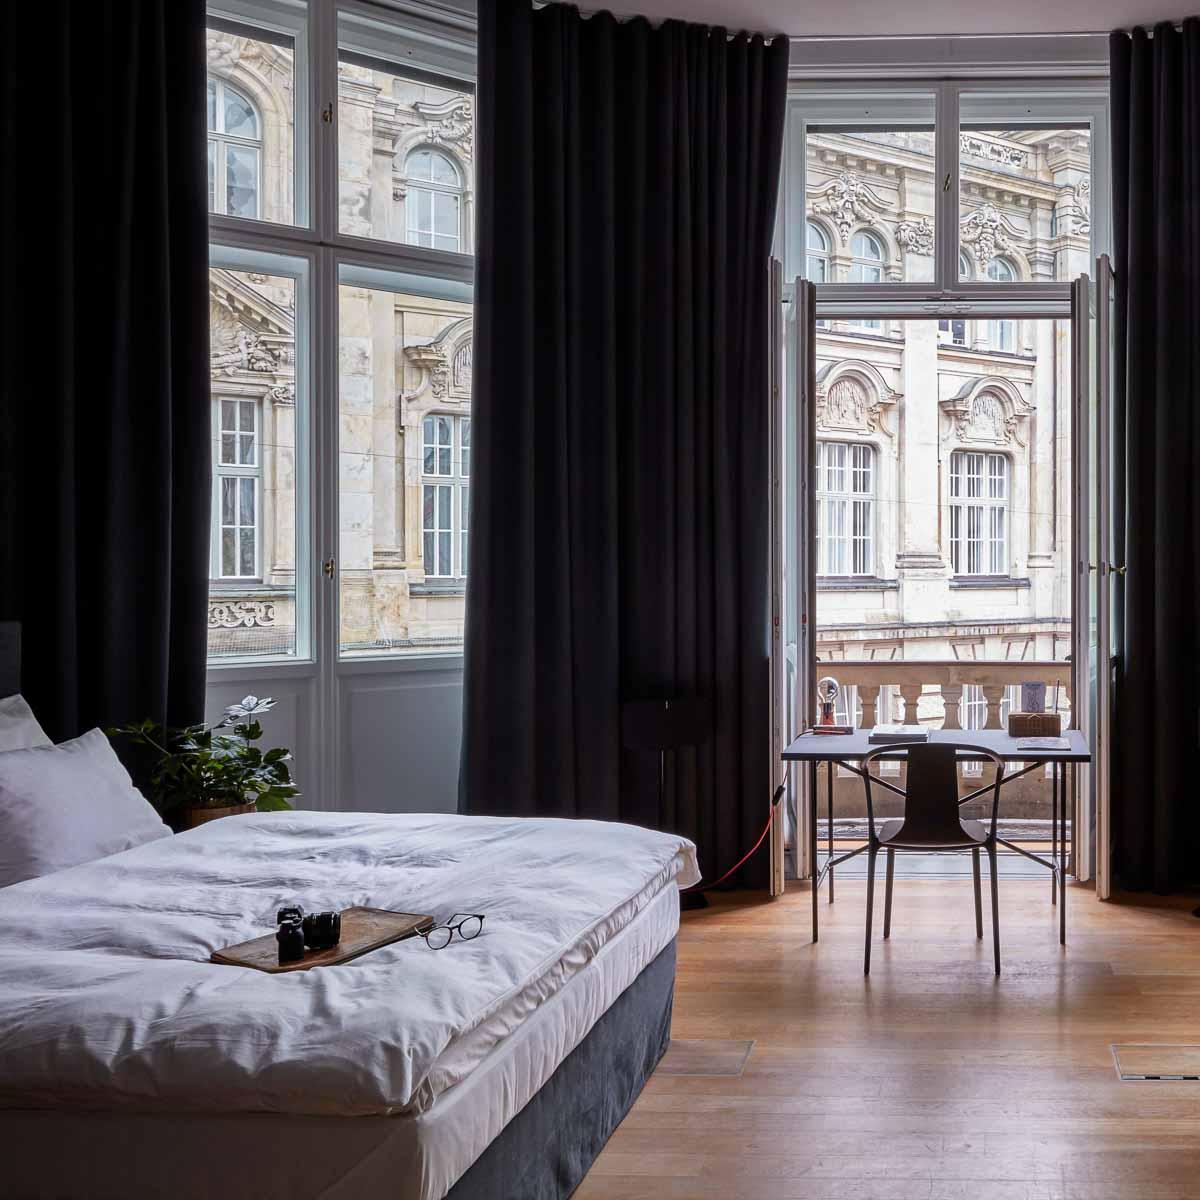 The Lovelace Hotel München